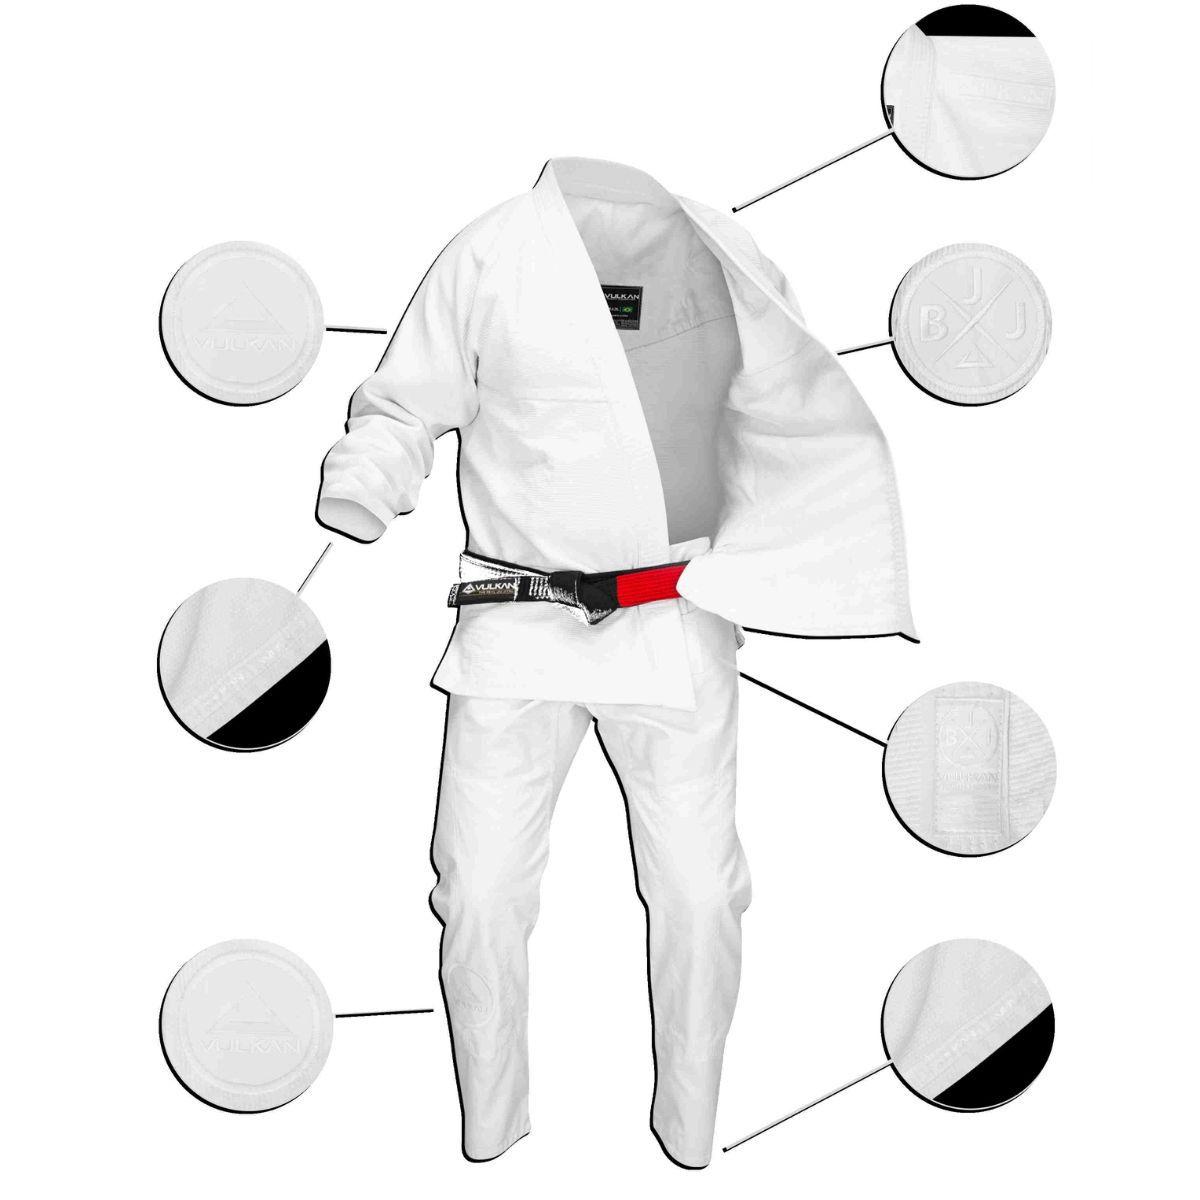 Kimono Vulkan Pro Stealth Para Jiu Jitsu Branco Profissional Adulto - Pro Stealth